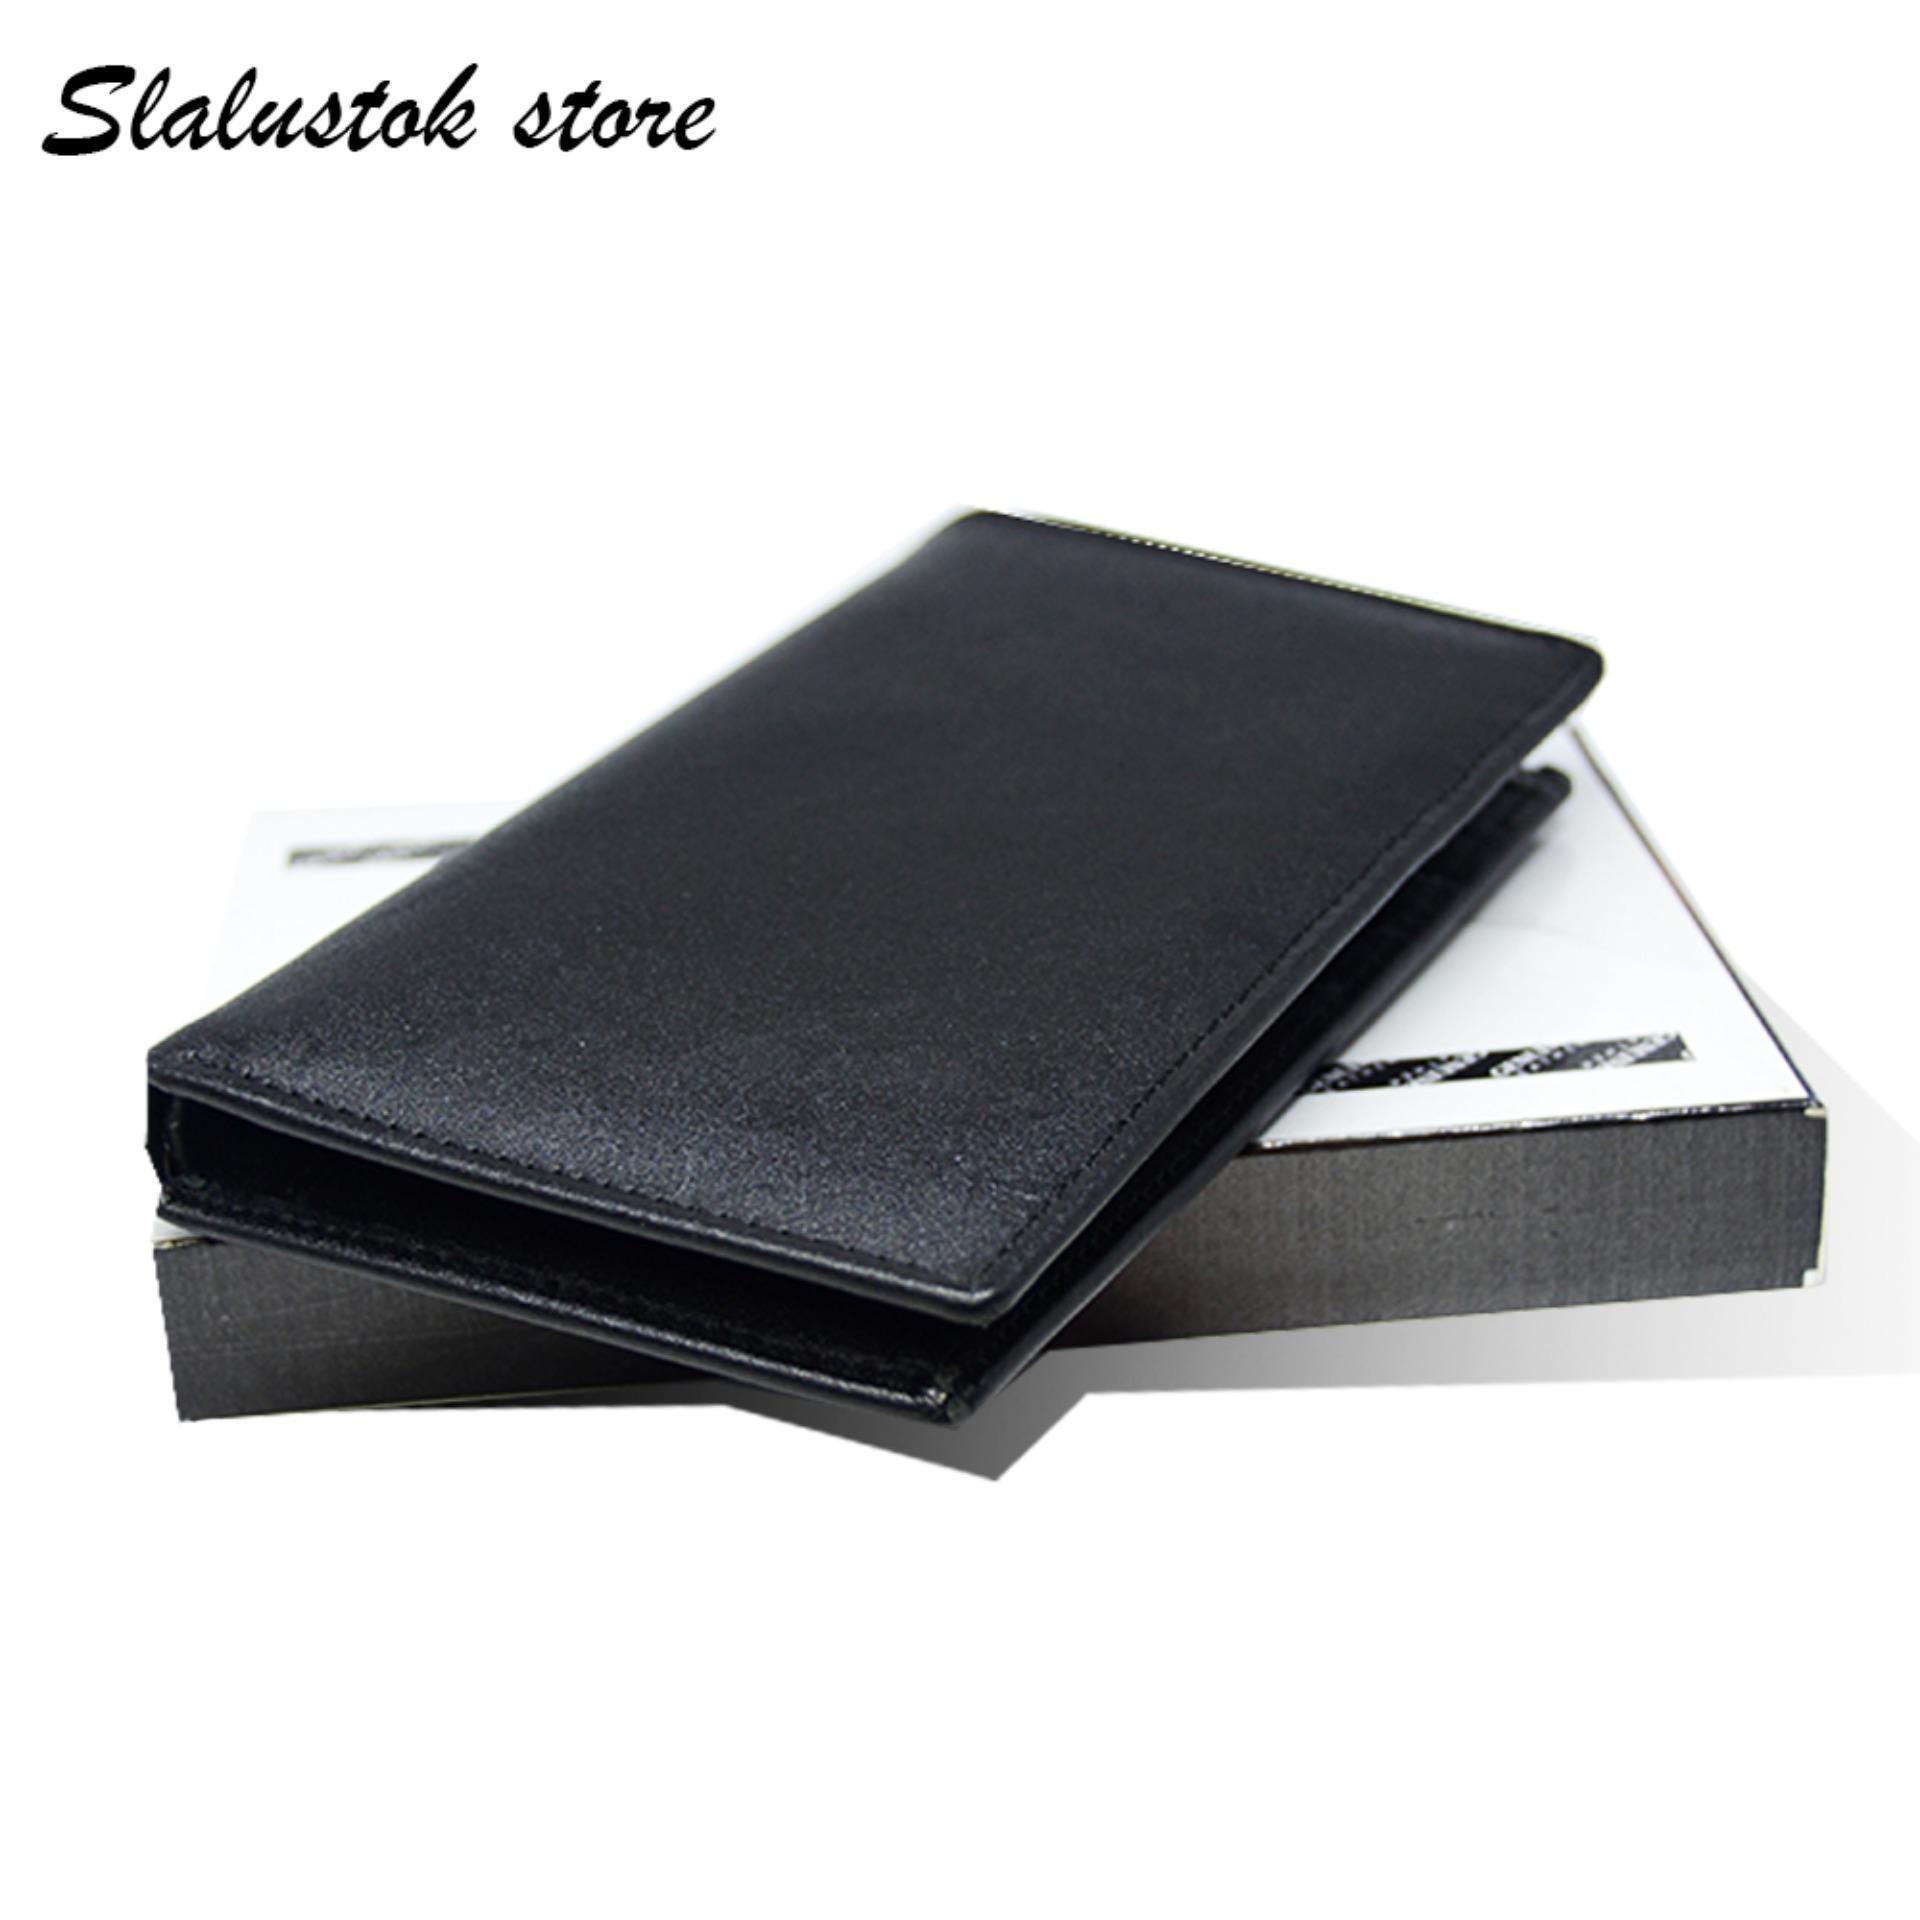 SlaluStoke Store - Fashion Dompet Pria Berdiri 3/4 Limited Edition Kulit Asli 100%